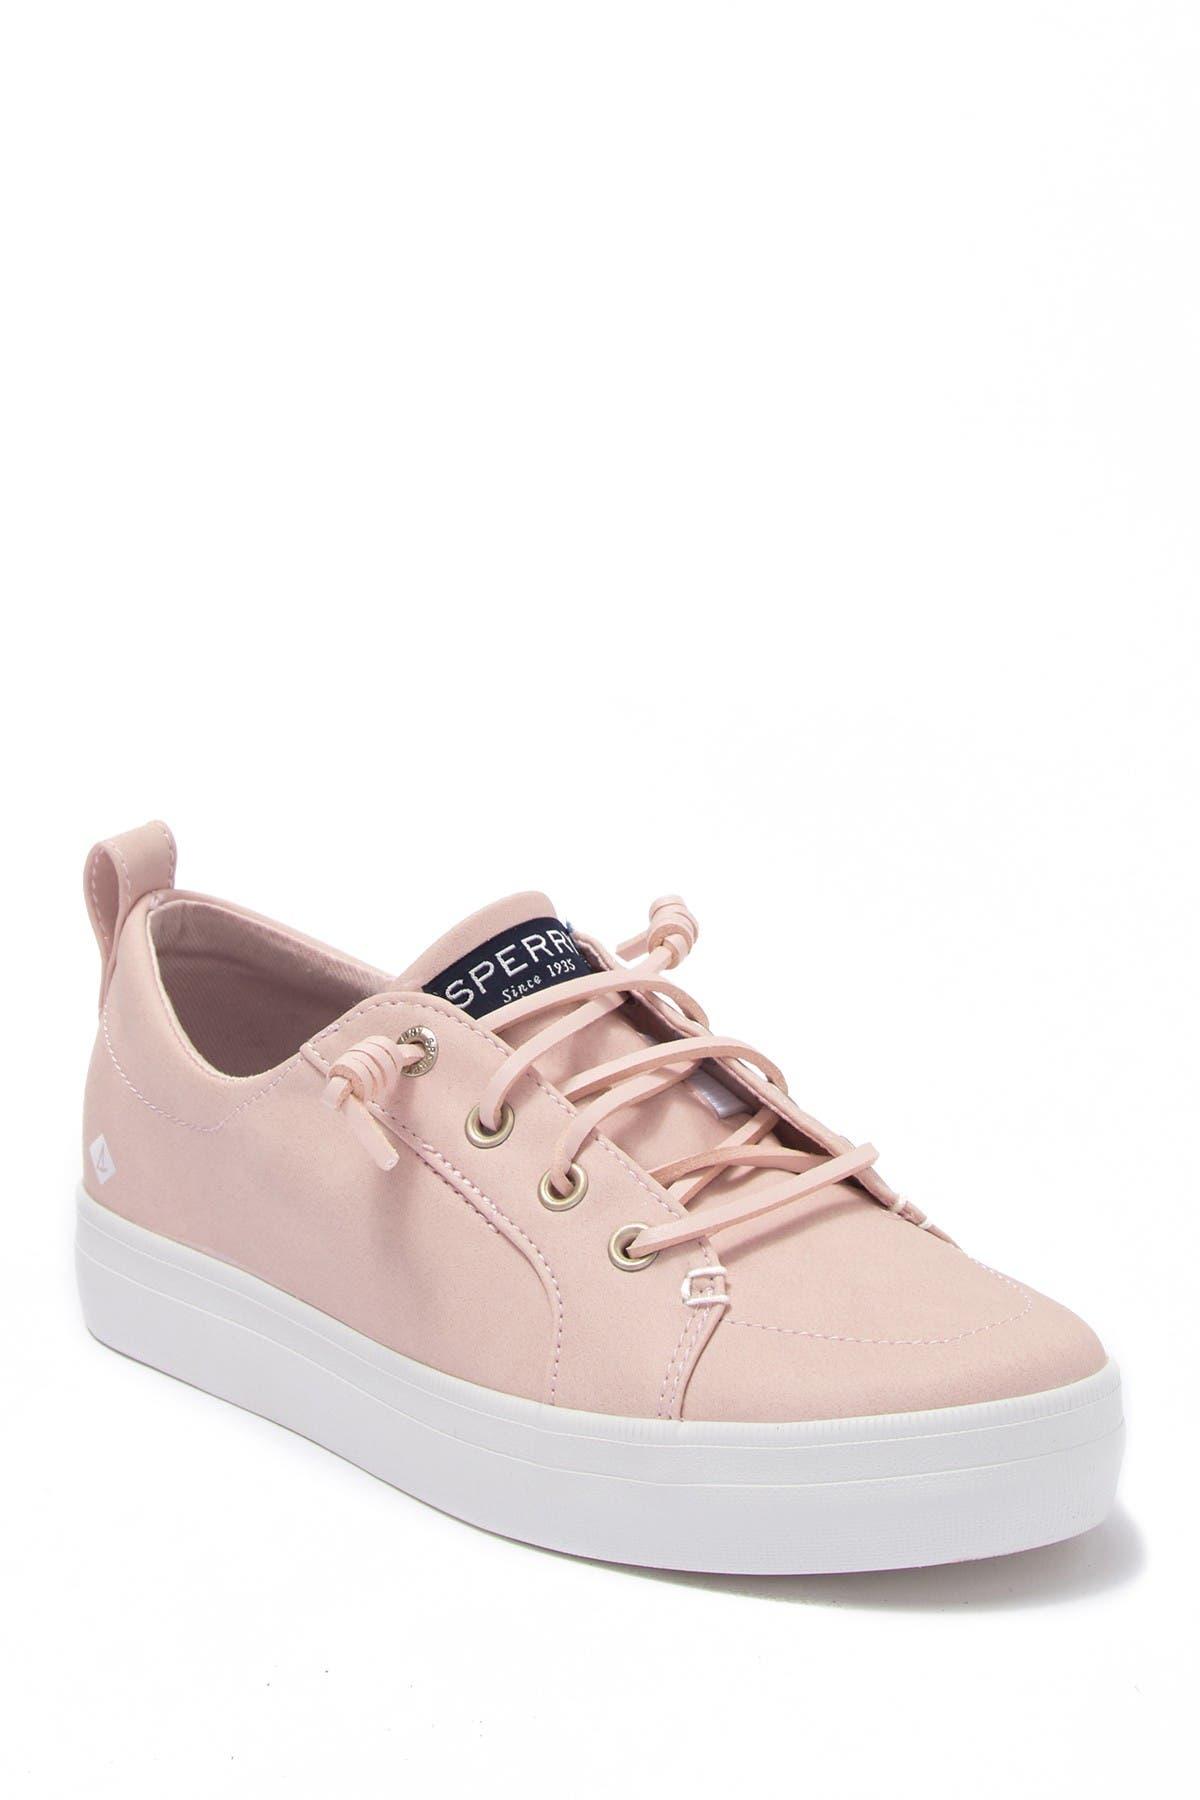 Sperry | Crest Vibe Jr Sneaker